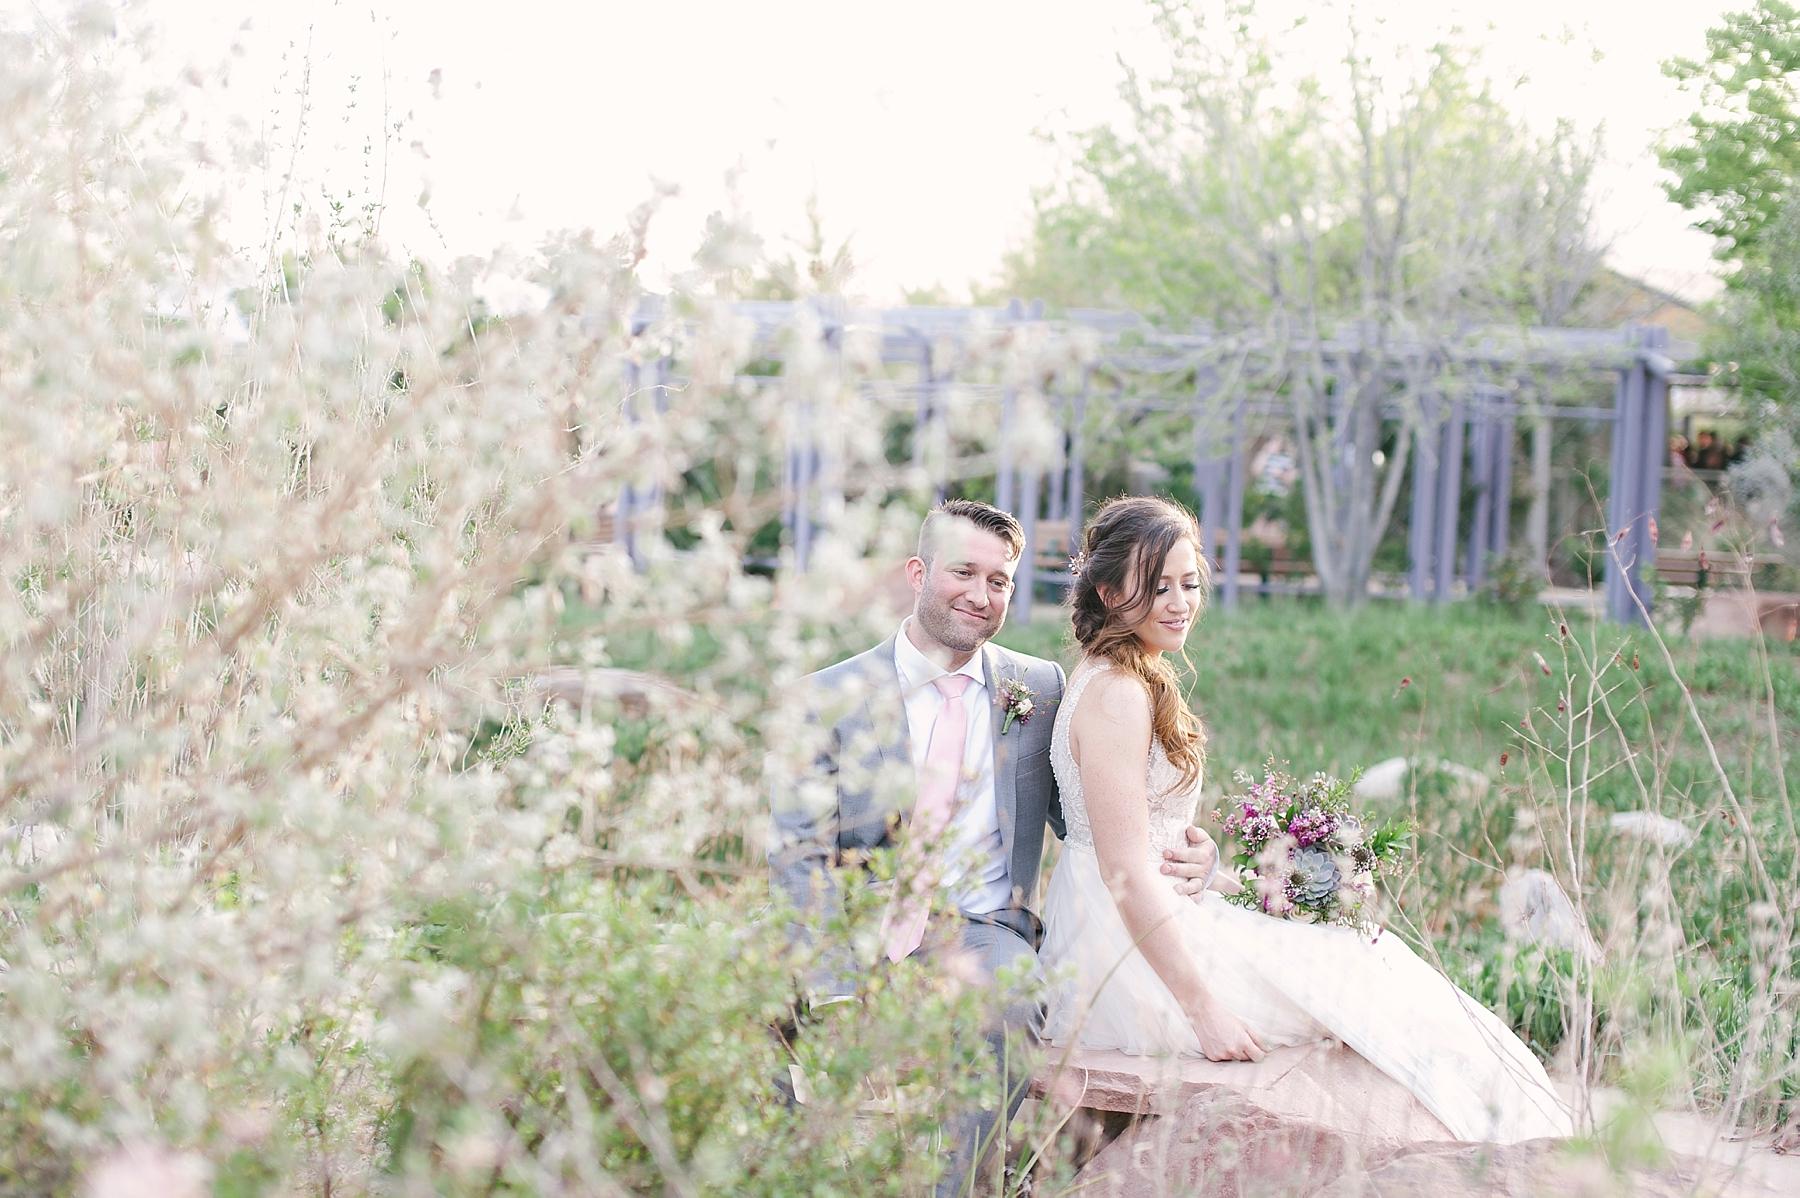 springs-preserve-wedding-las-vegas-destination-photography-the-emerics-32.jpg